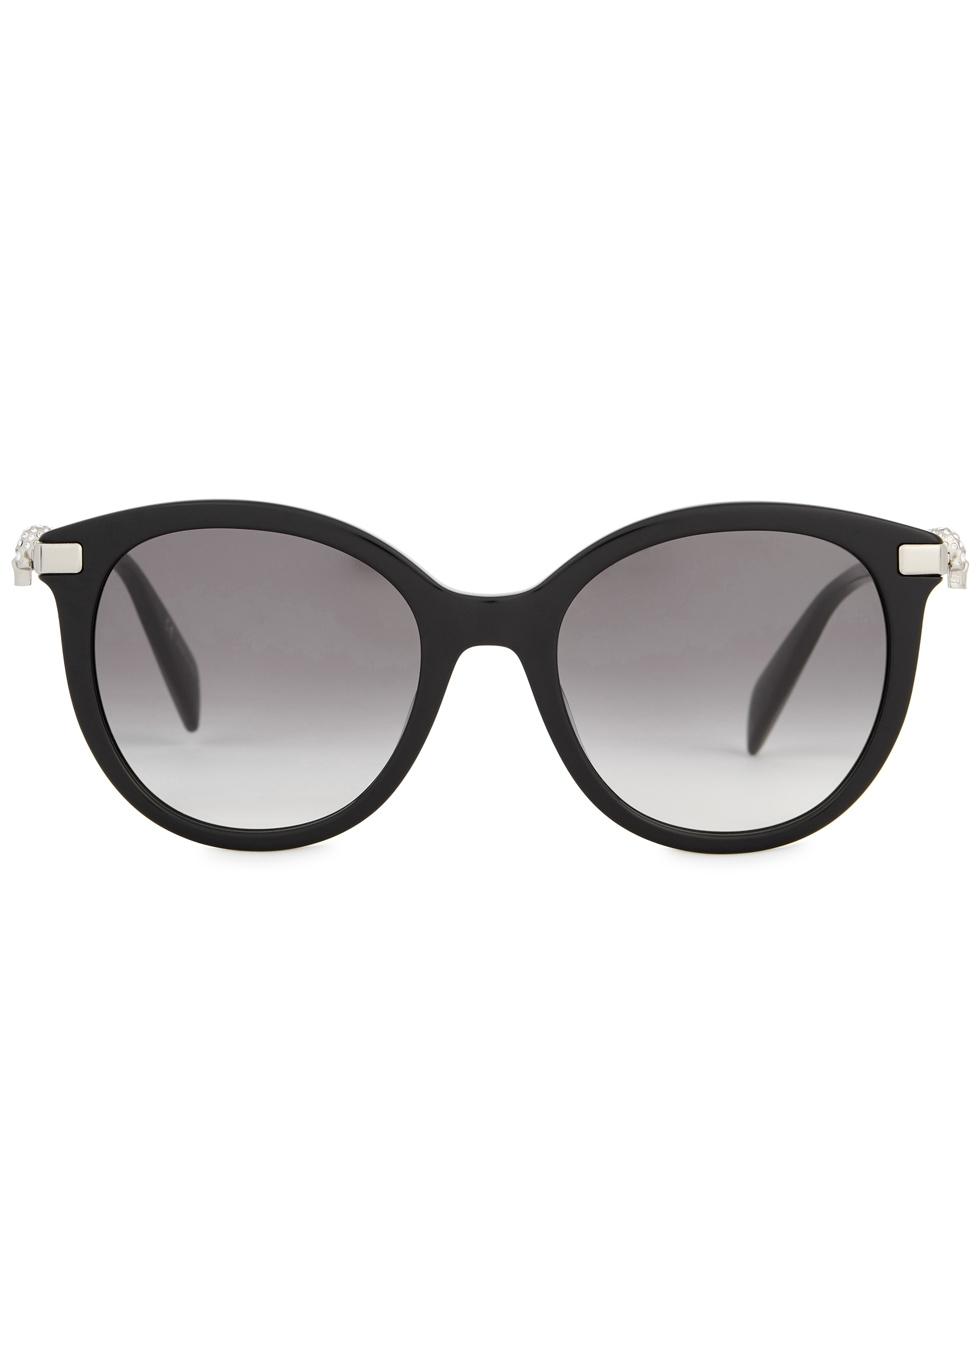 Black oval-frame sunglasses - Alexander McQueen